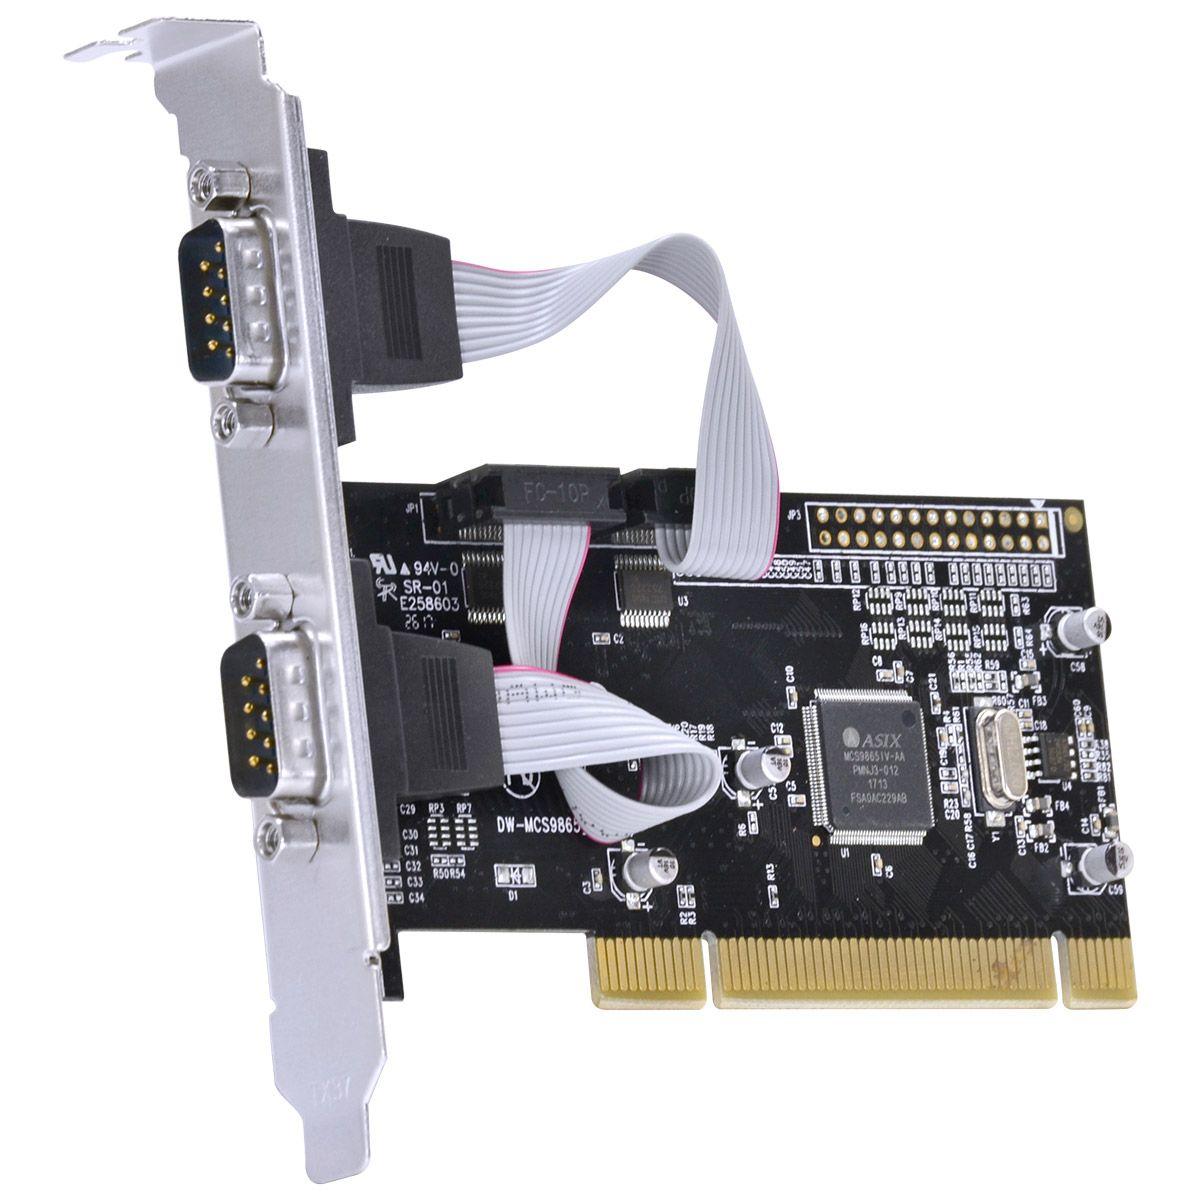 Placa Serial 2 saídas + 1 Saída paralela PCI P2IE1PR-PCI 30079 - Vinik